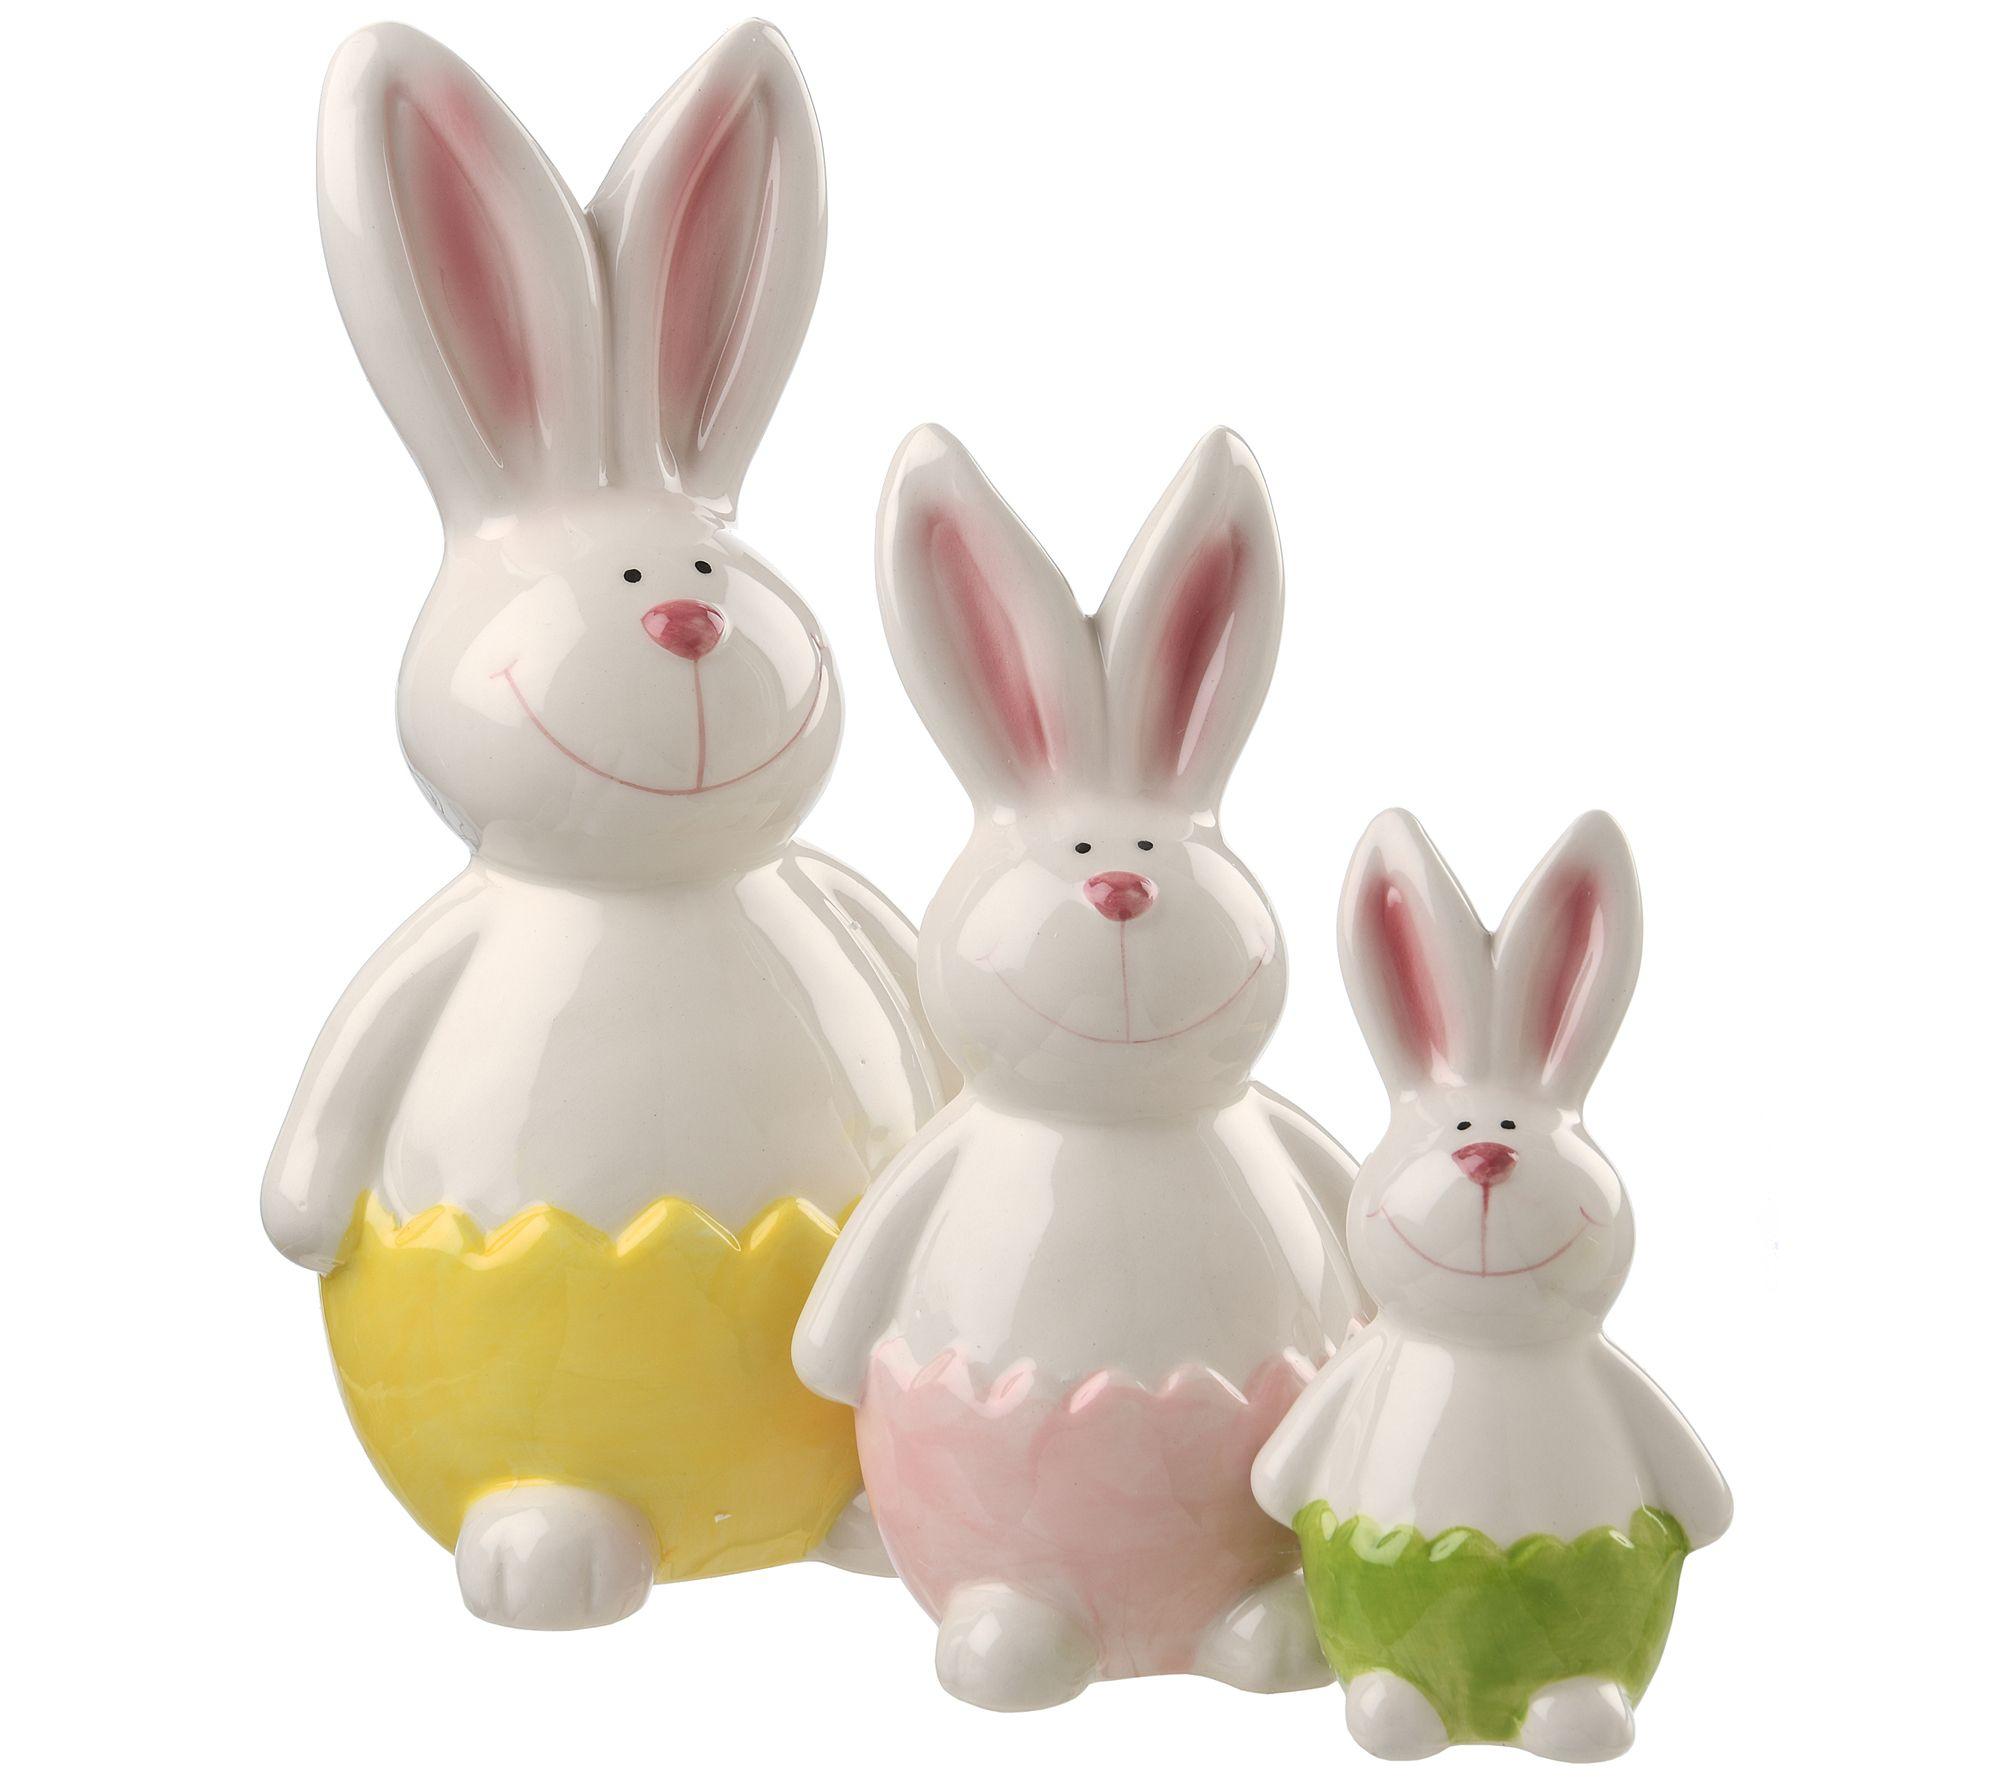 Easter 3 Piece Set Ceramic Decorative Easter Bunny Bunnies Rabbit Figurines Spring Medalex Rs